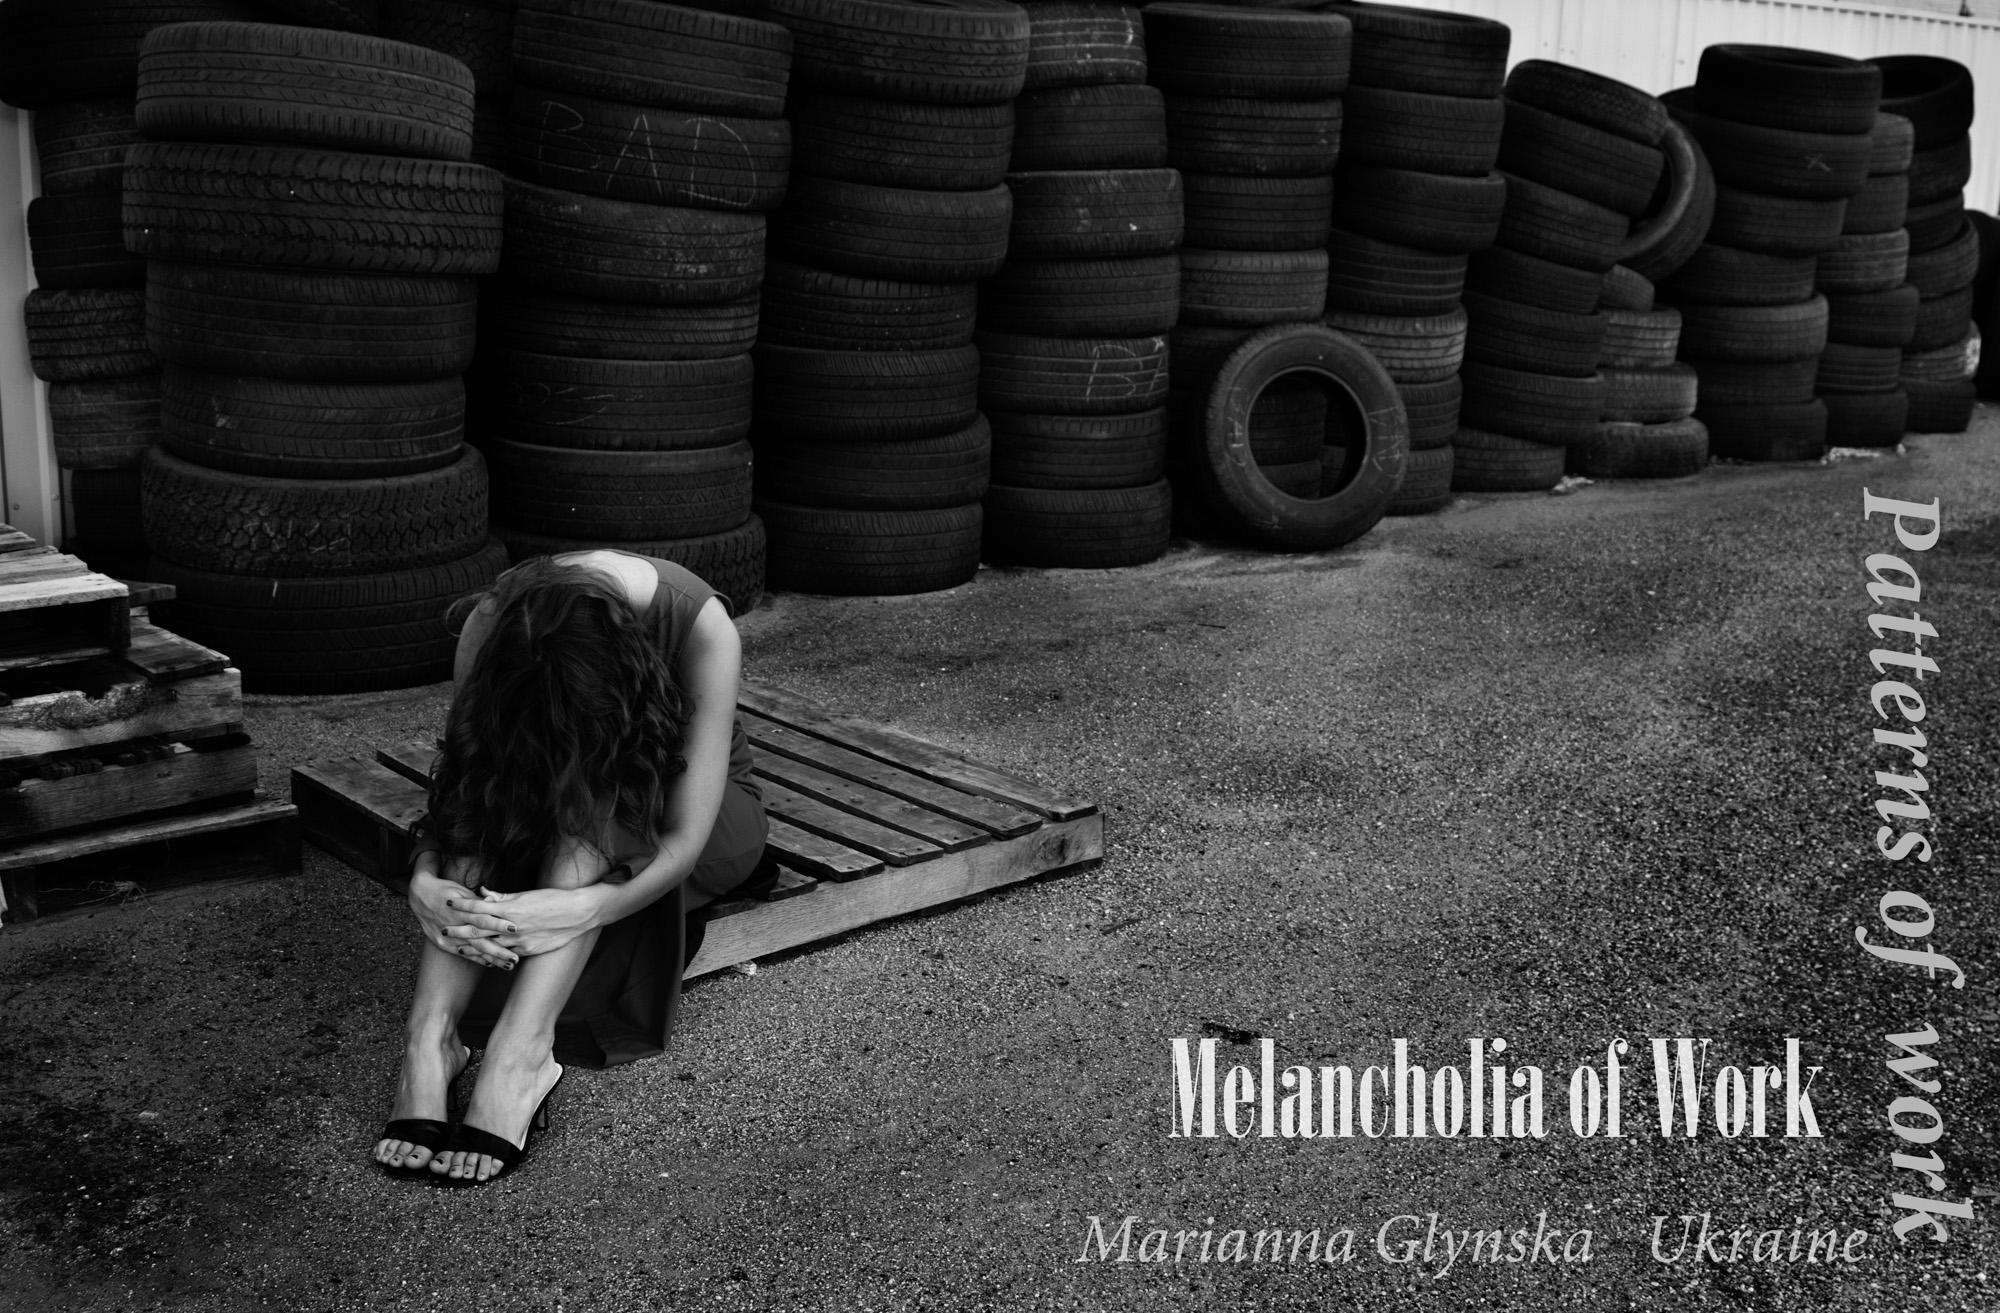 Marianna Glynska, Ukraine